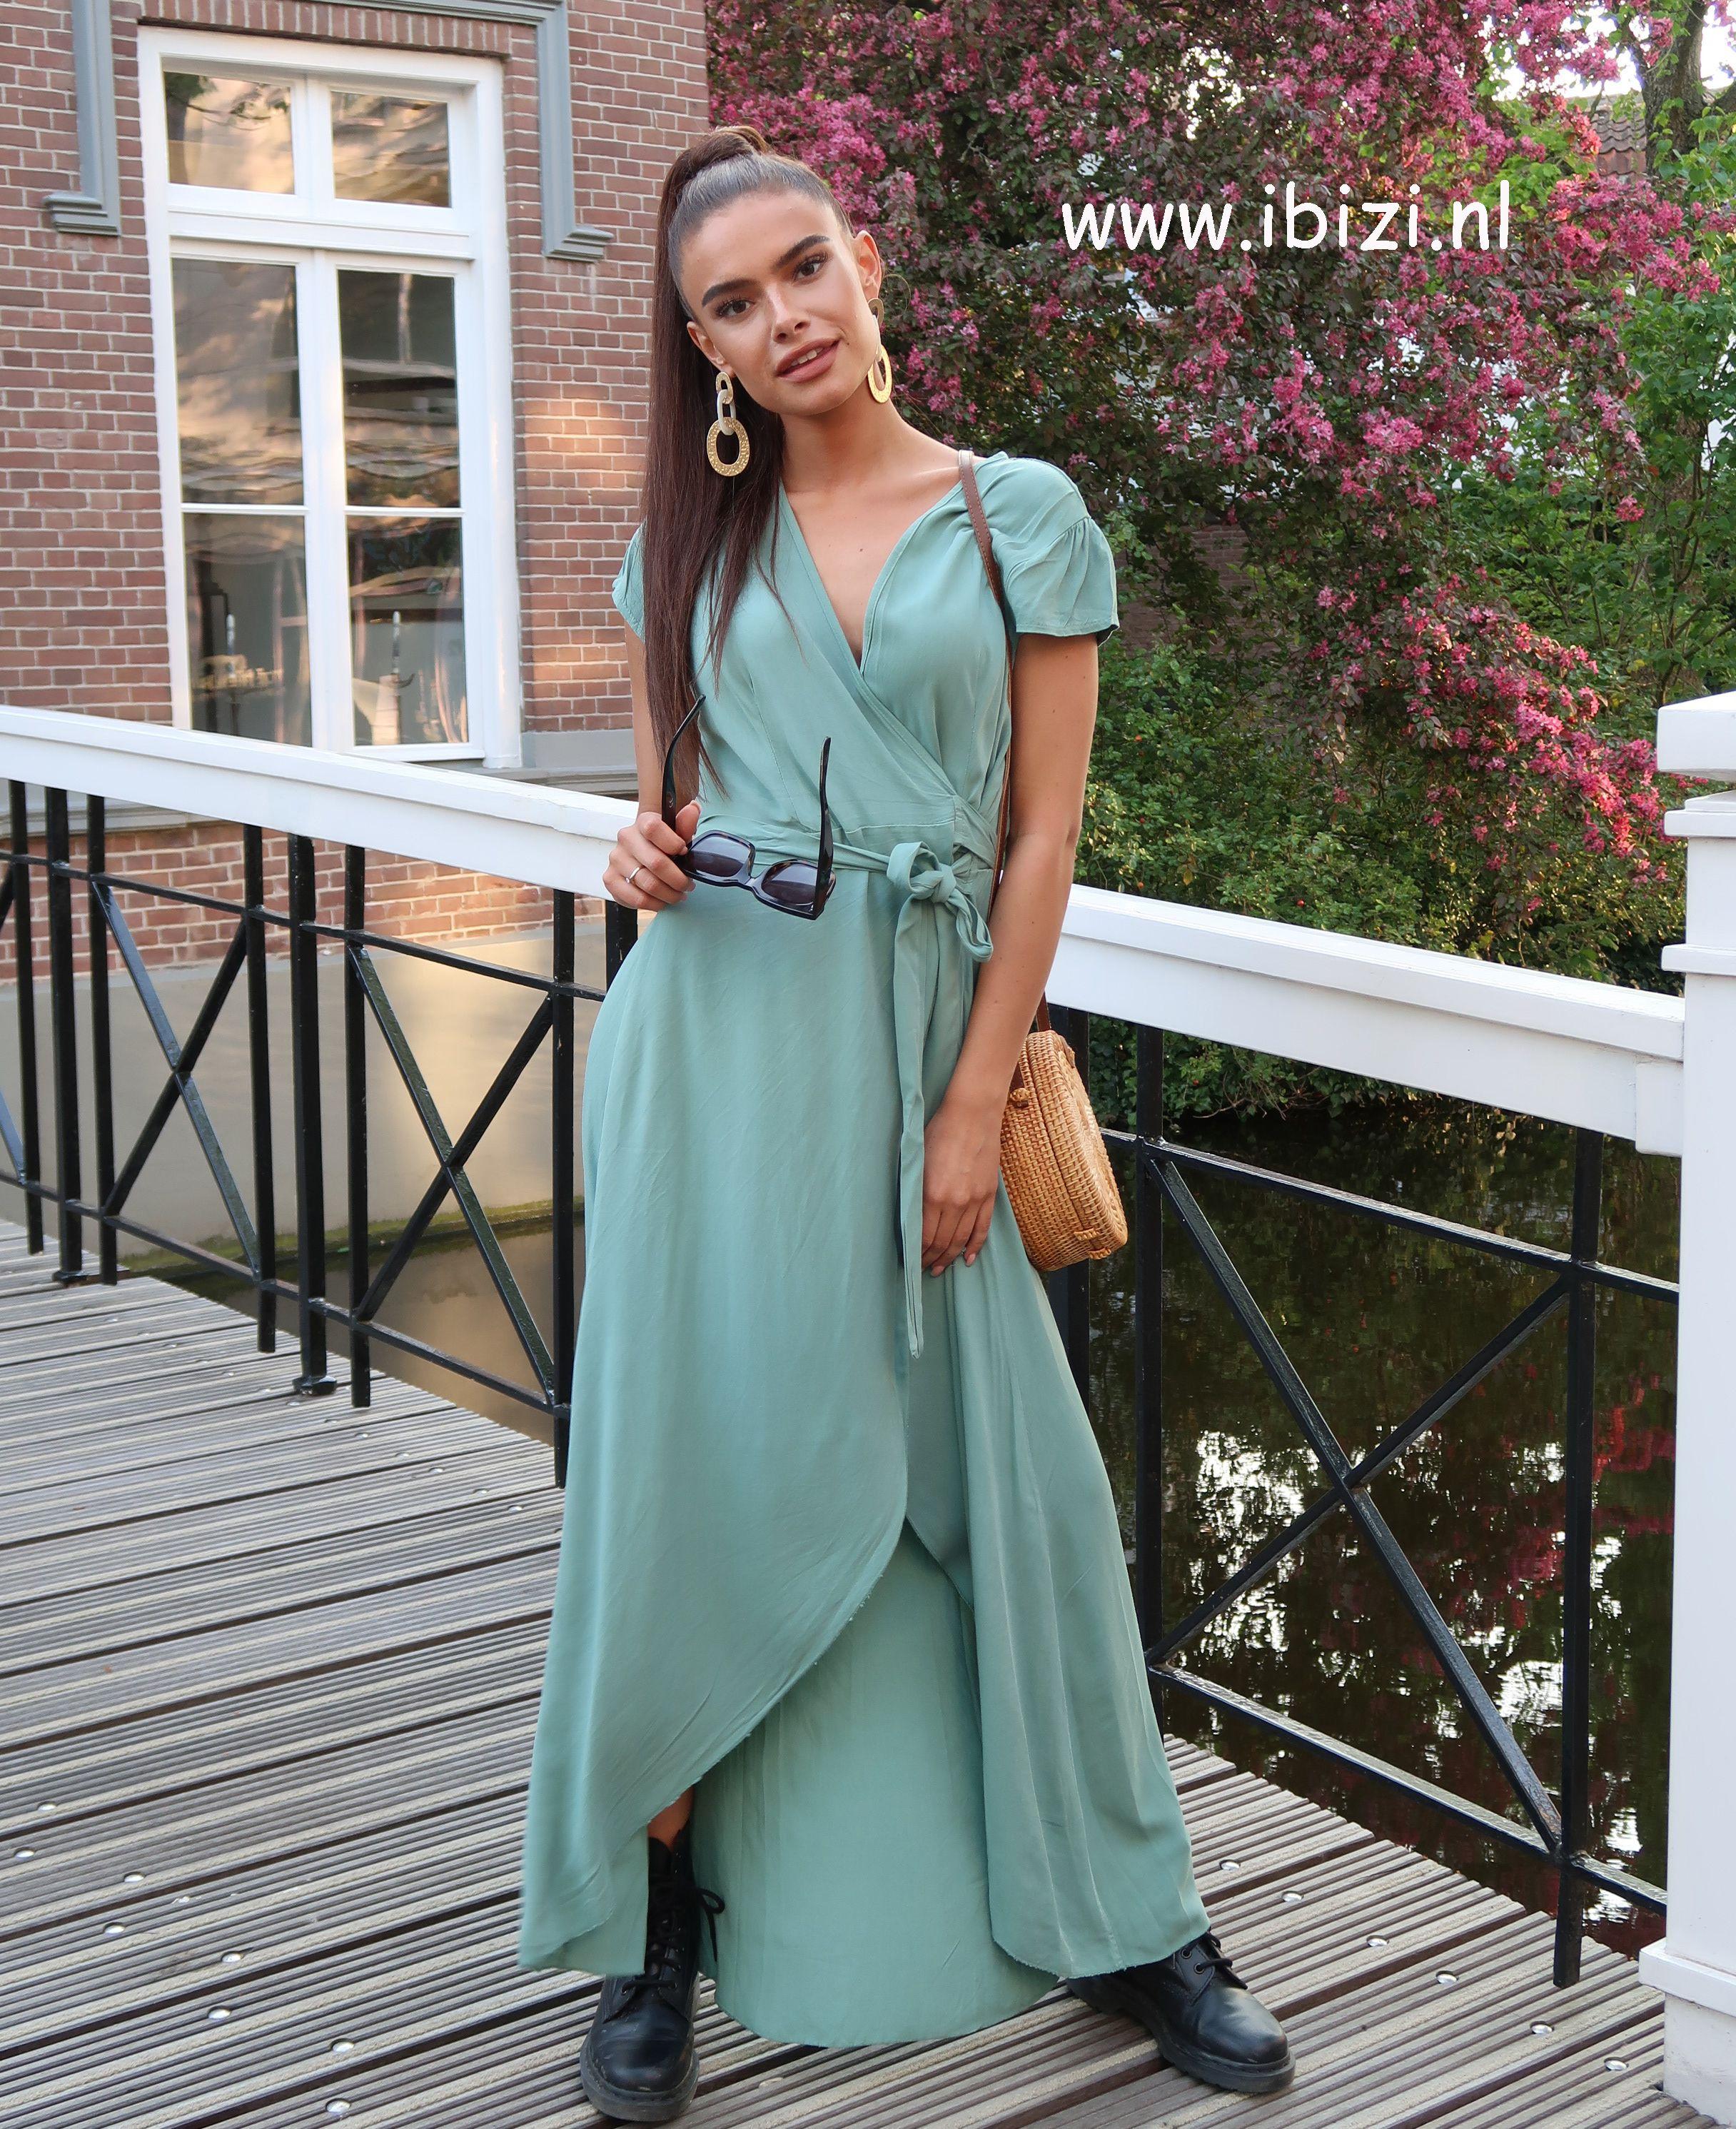 Verbazingwekkend Maxi Jurk Dames Festival (met afbeeldingen) | Bruiloft gast jurken CL-06